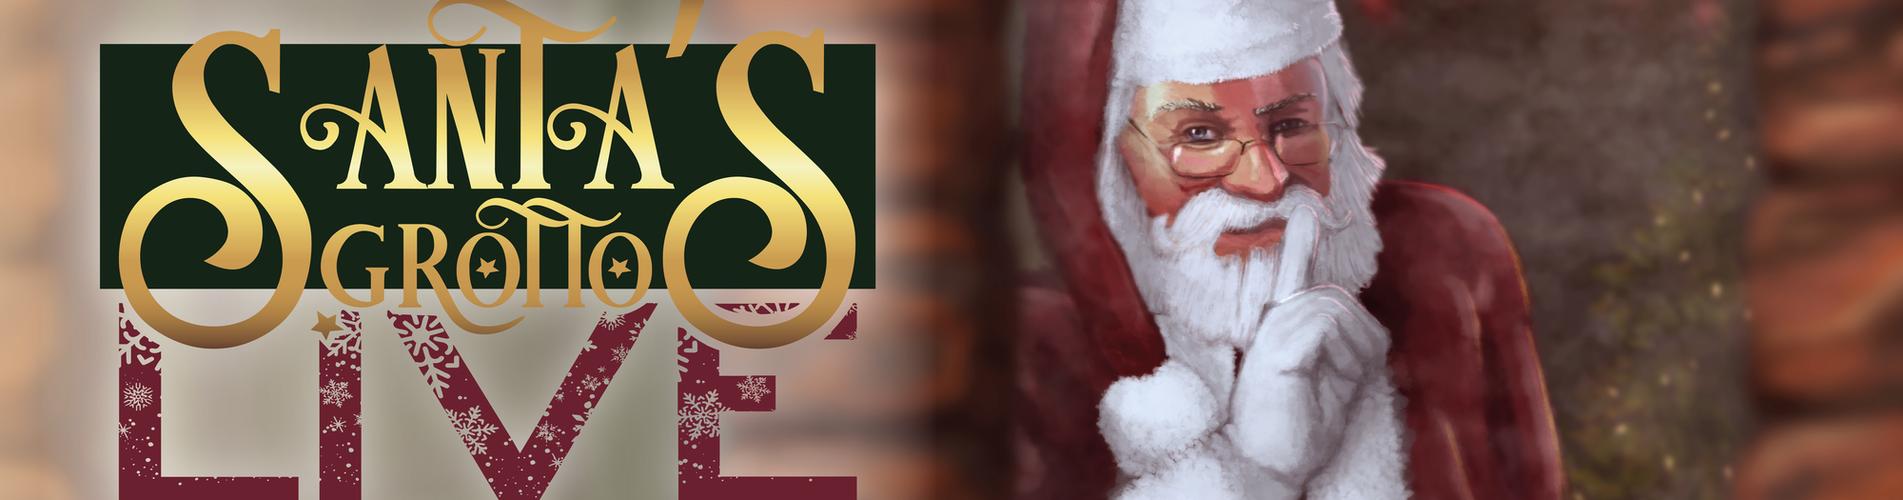 Santa's Grotto Live poster